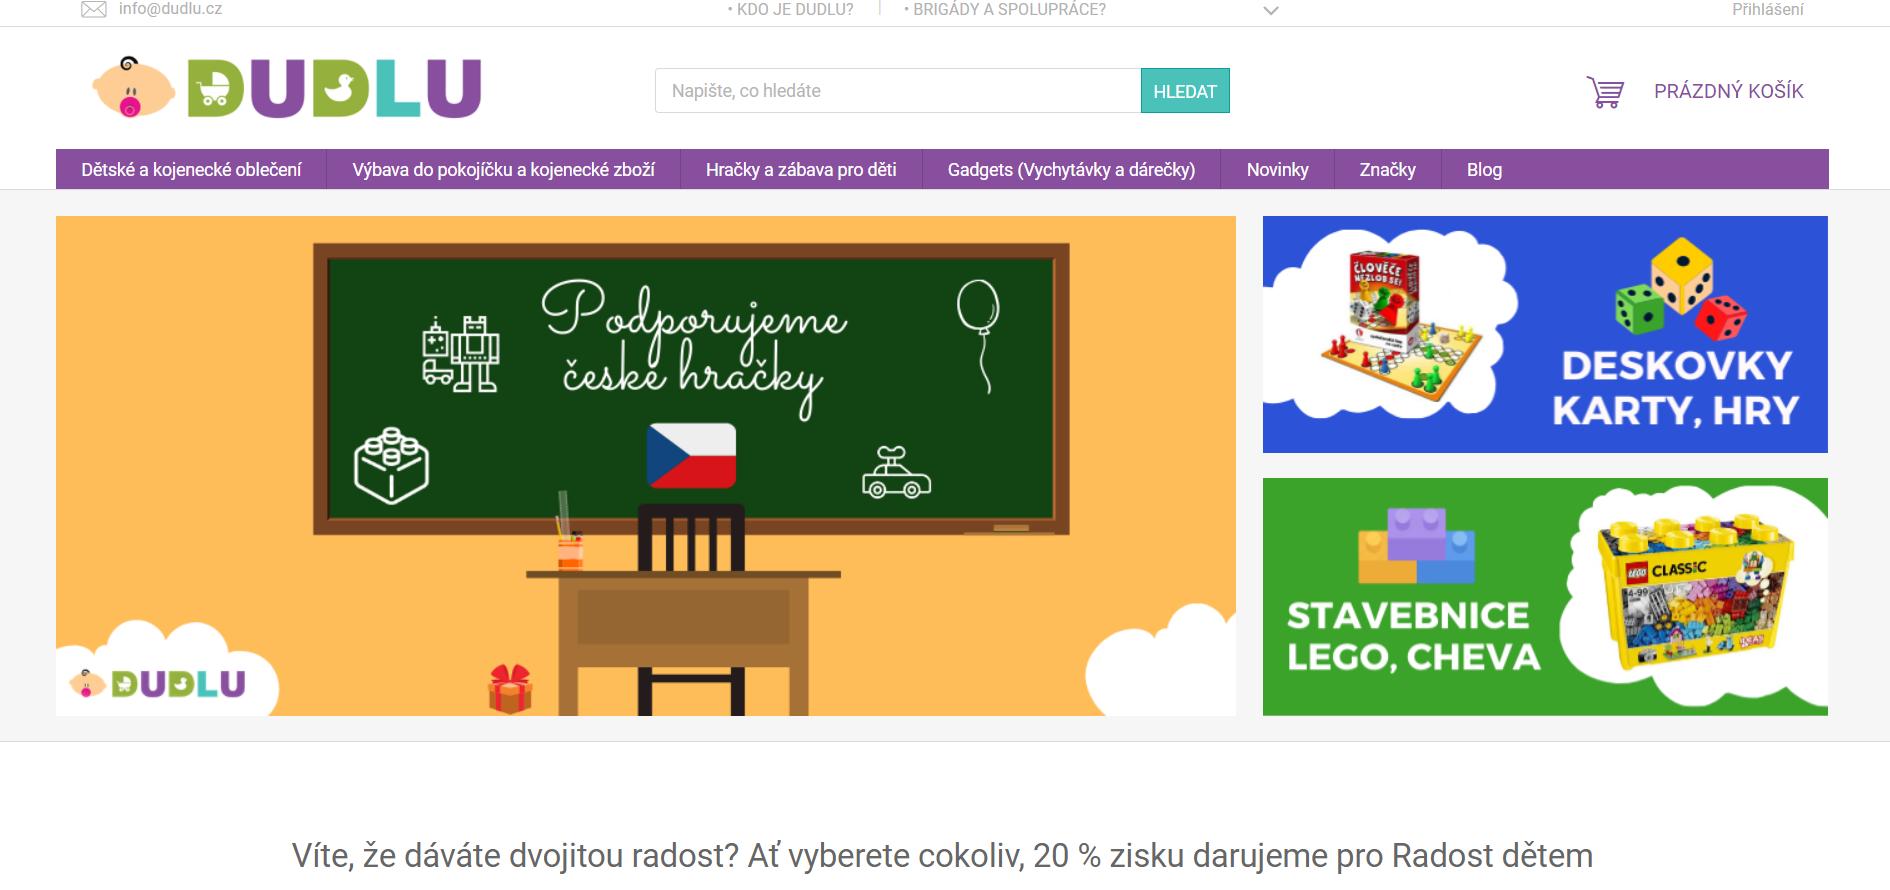 HP dudlu.cz